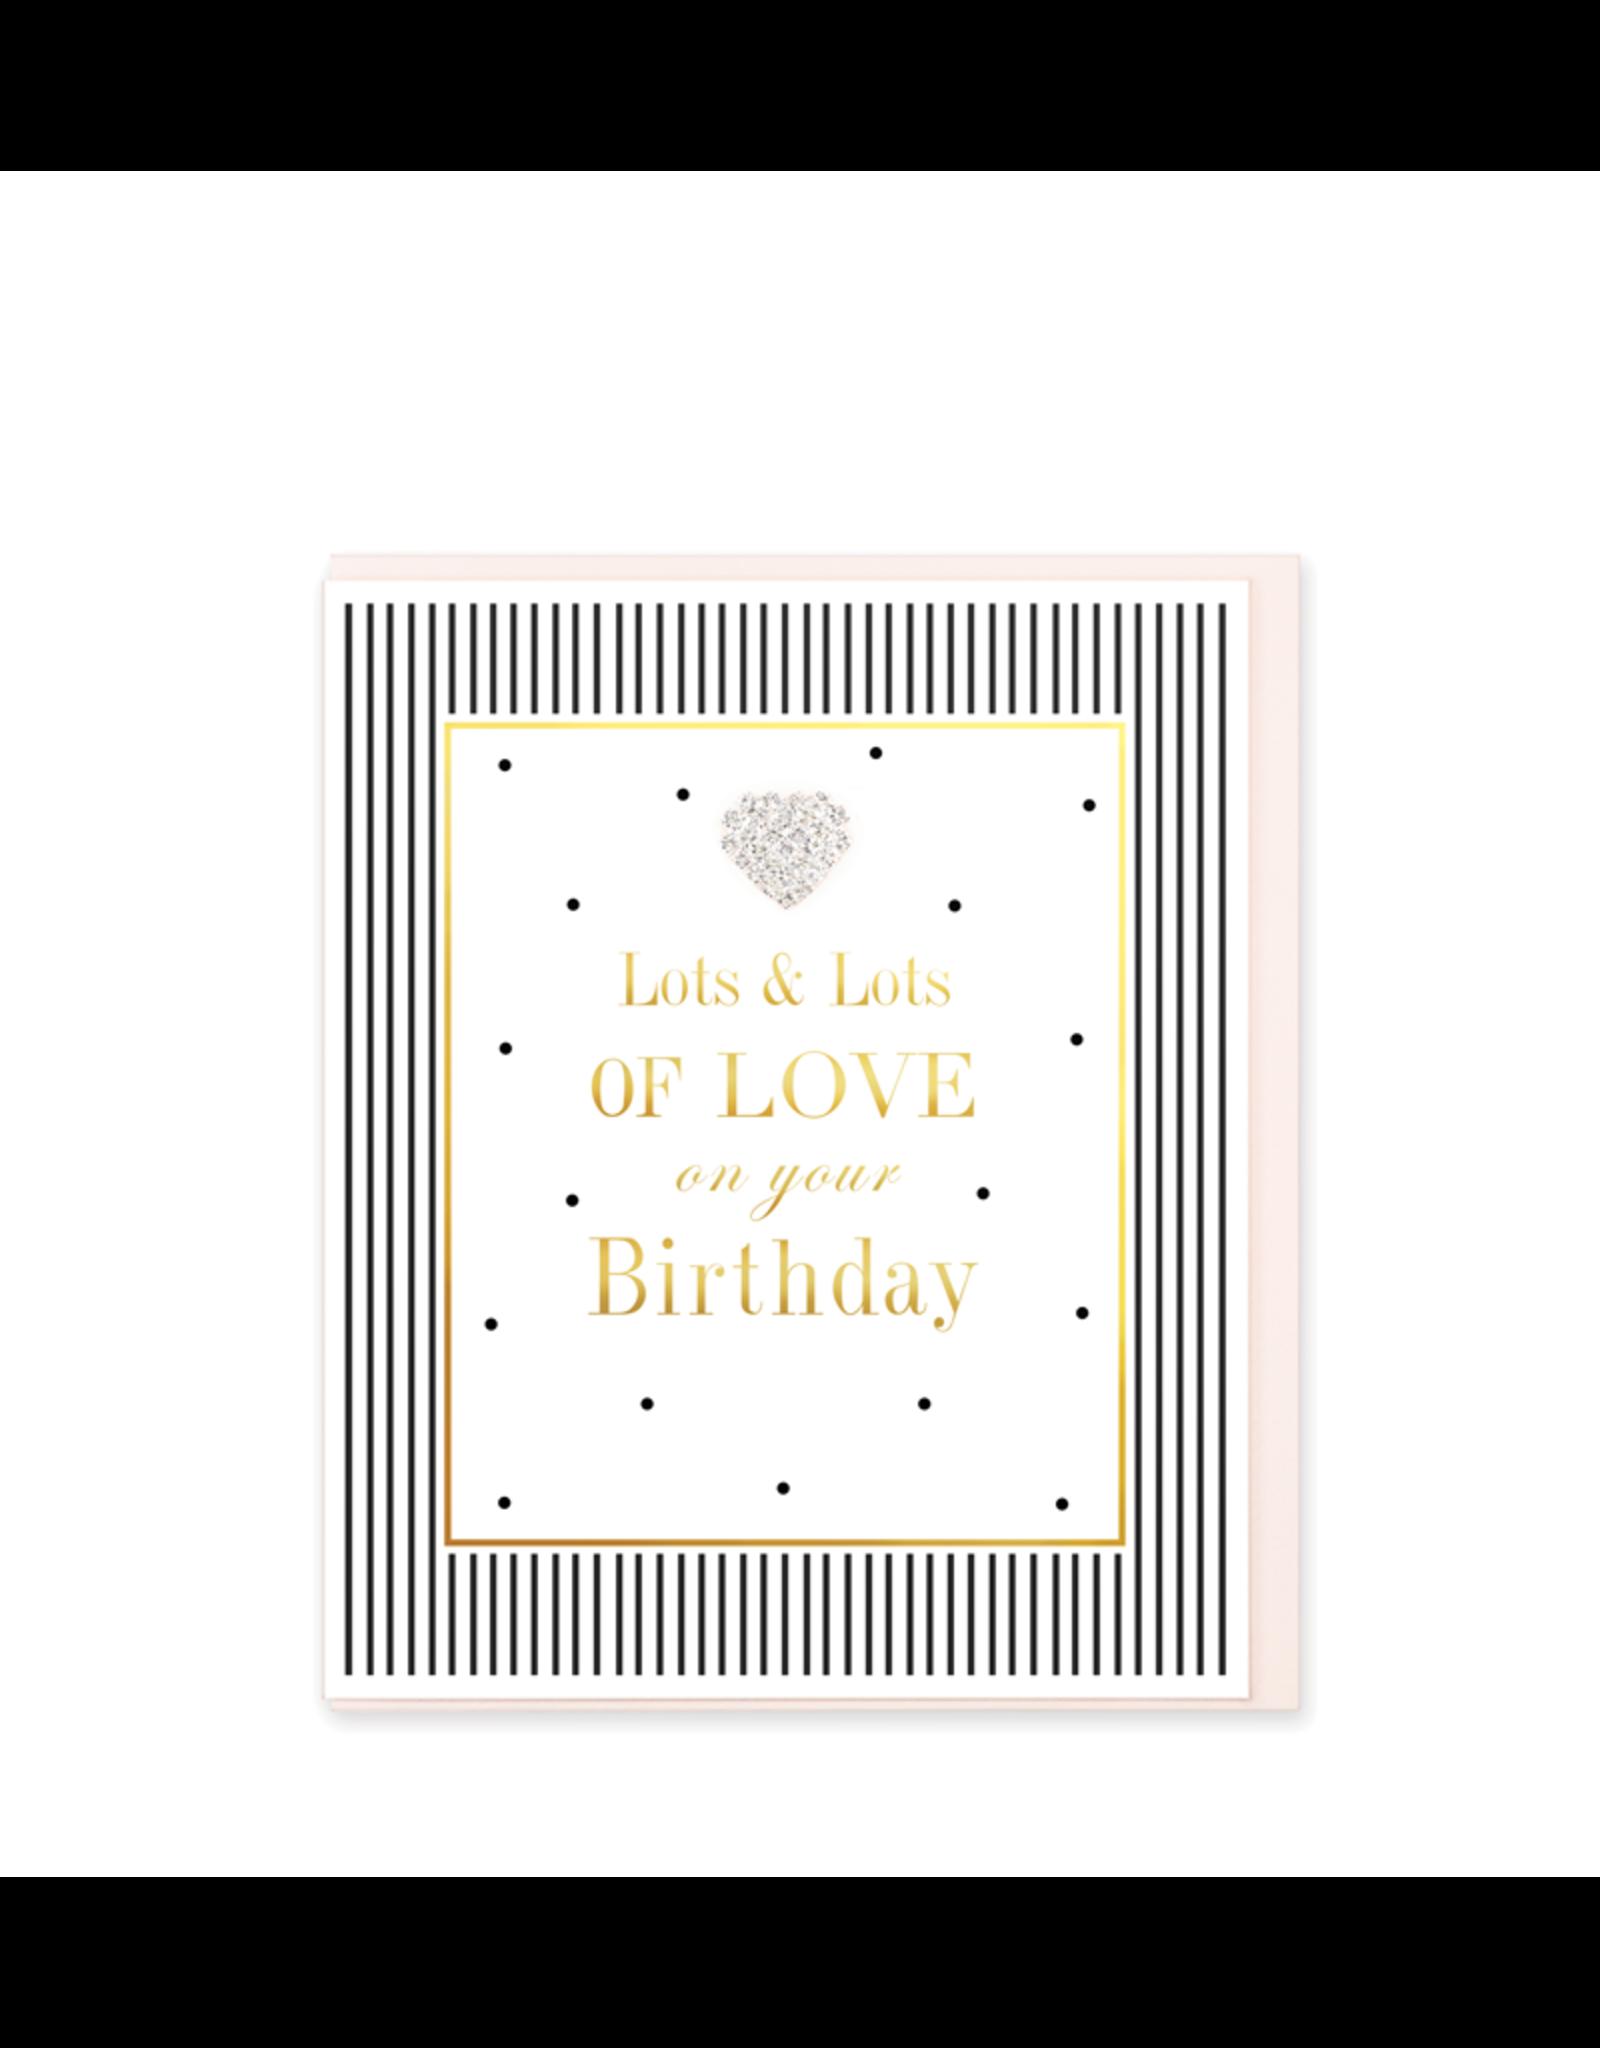 Hearts Design Wenskaart - Lots of Love on your Birthday